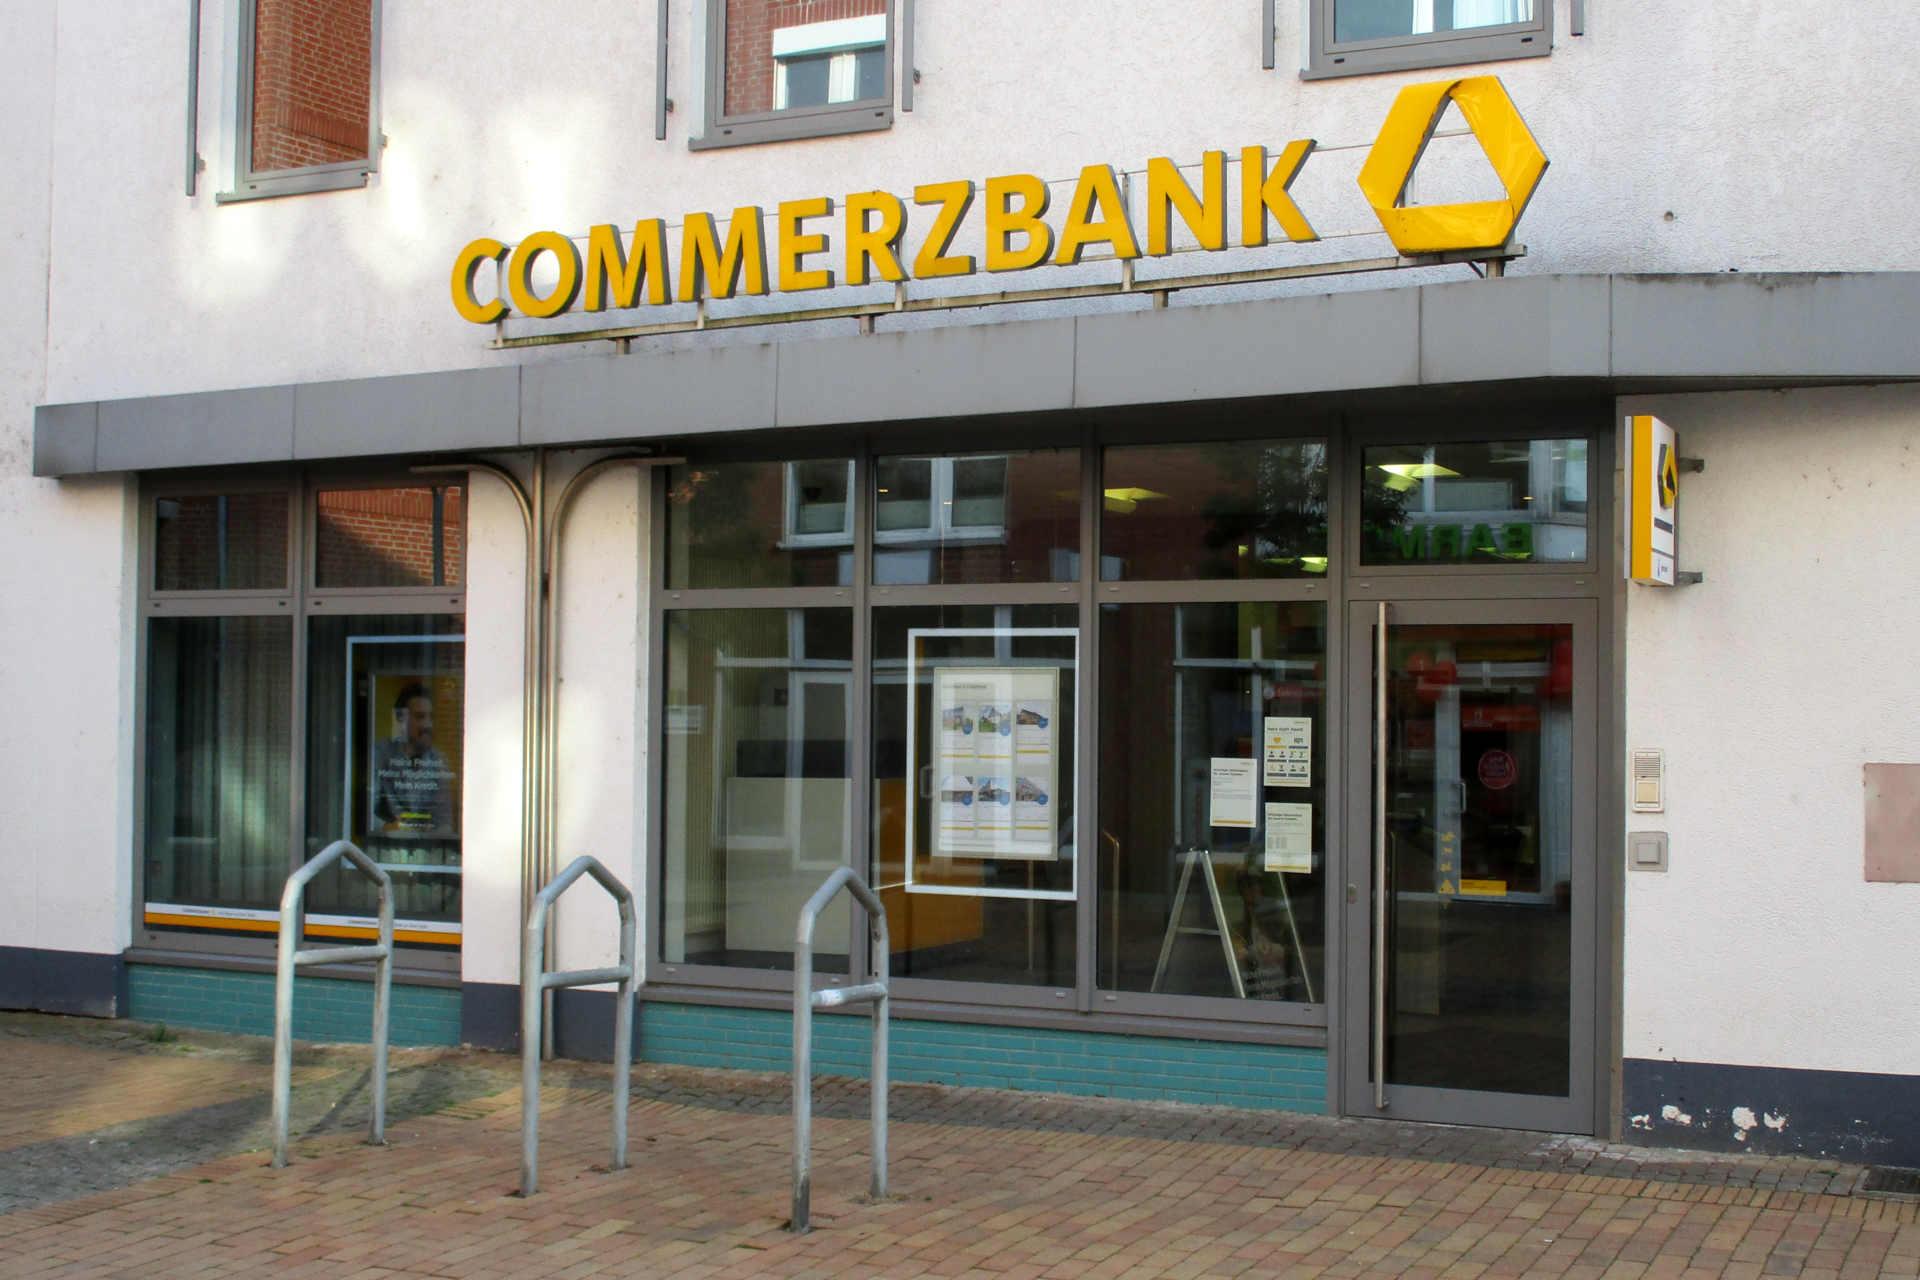 Commerzbank Wunstorf